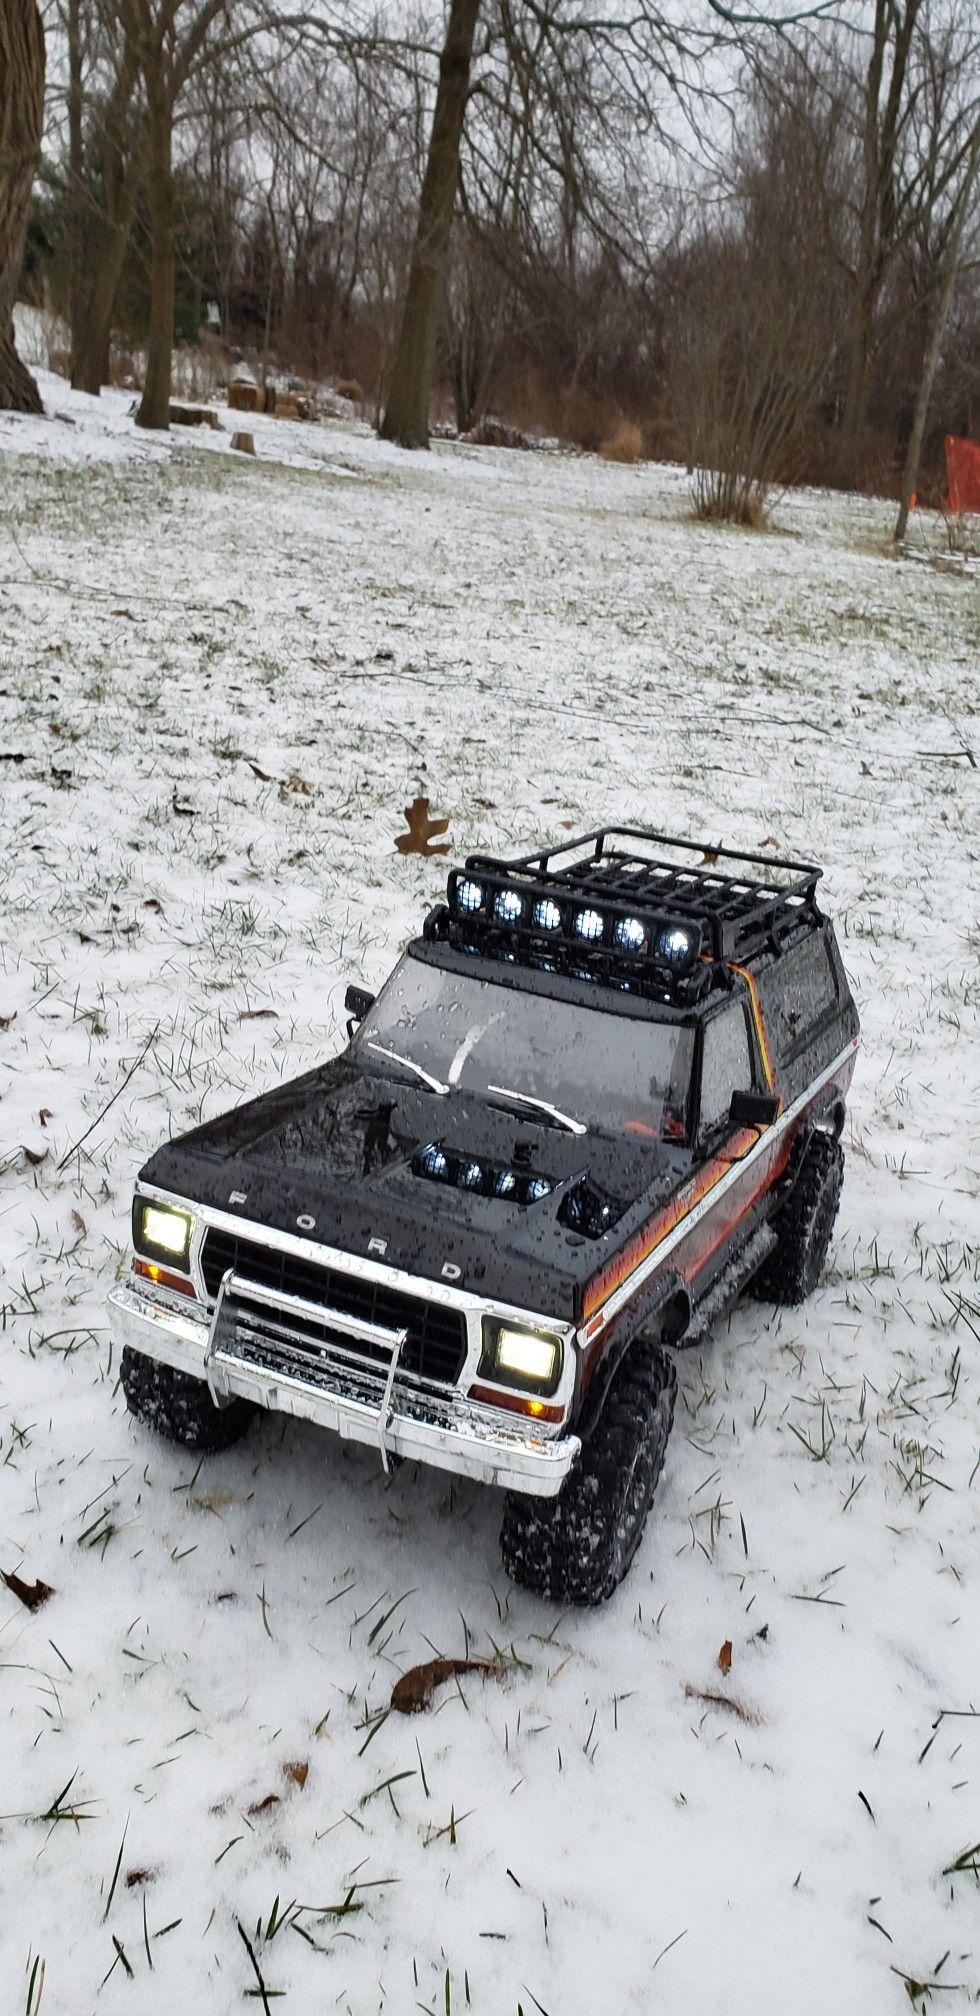 loves a snowy, rocky, bumpy trail! traxxas trx4